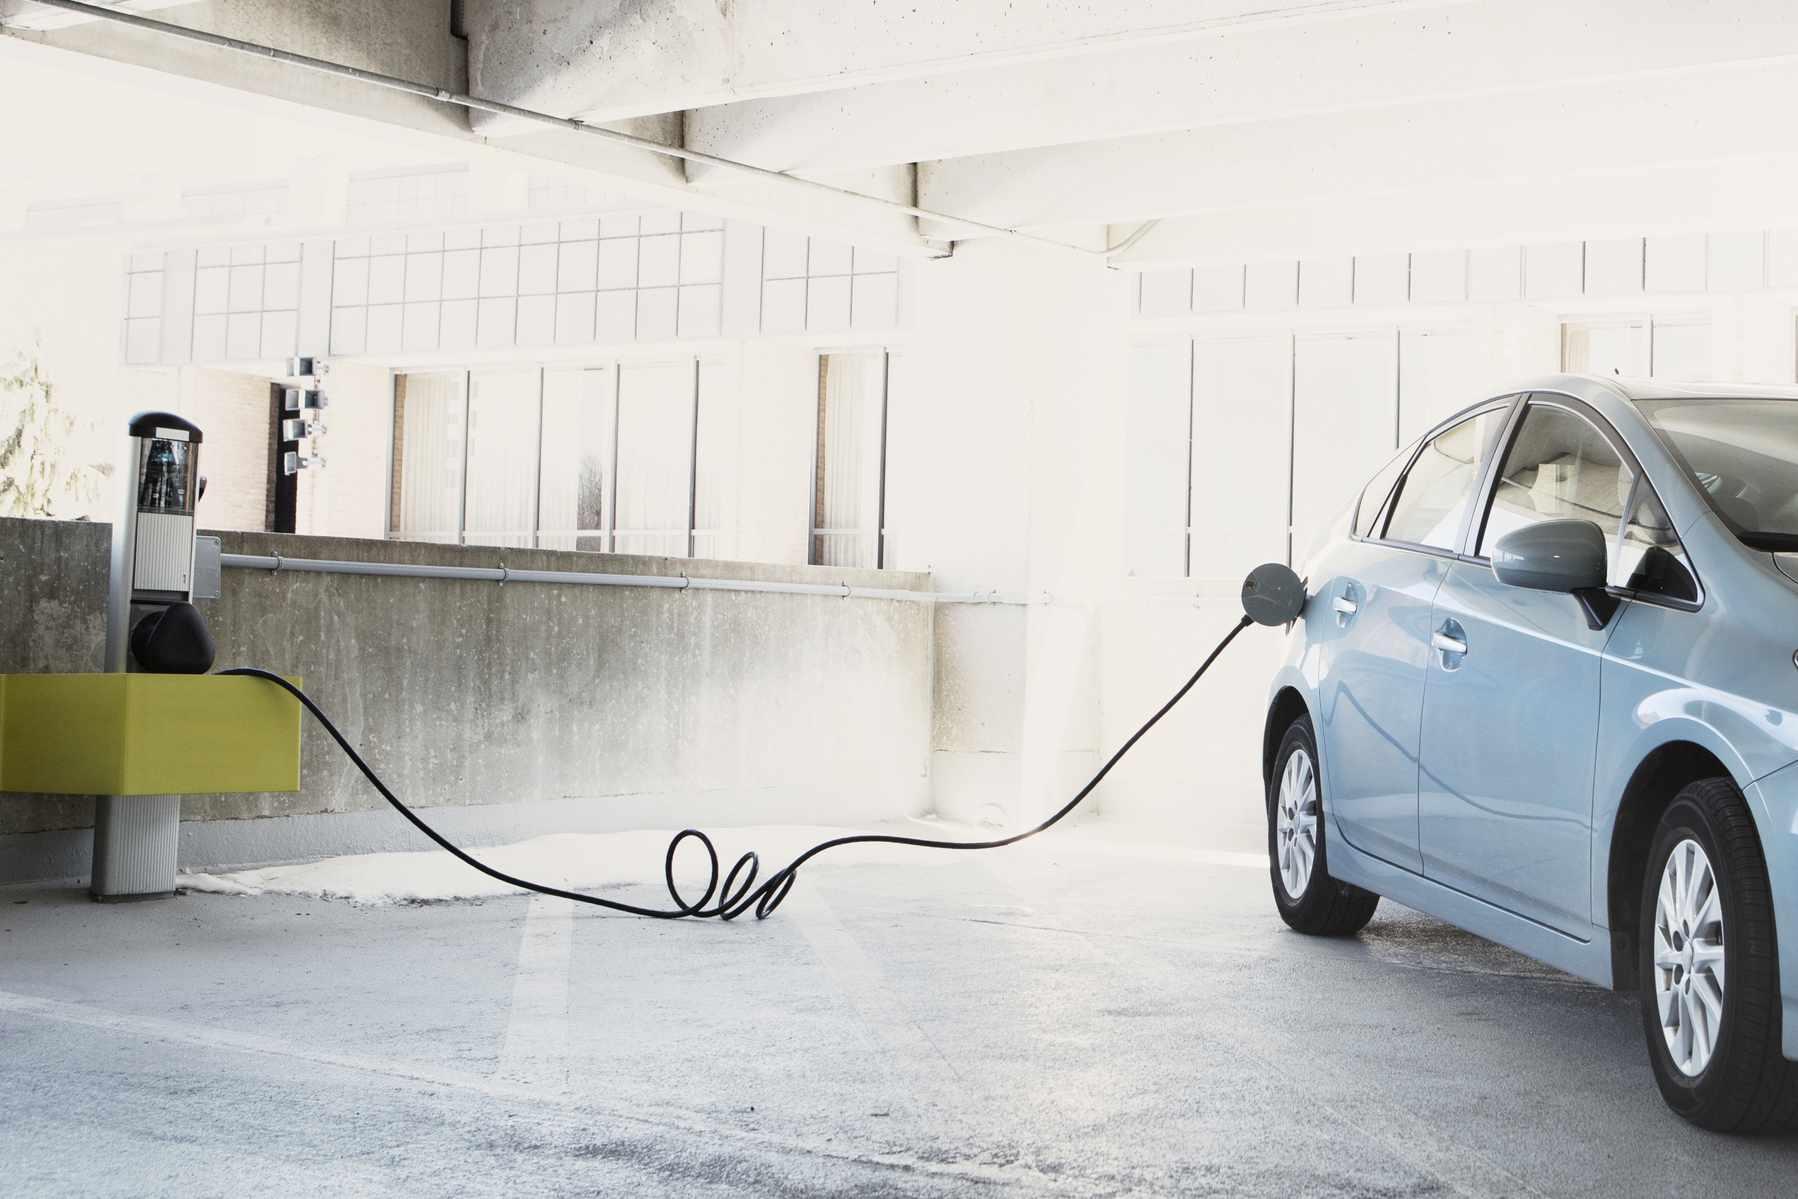 Electric car plugged in.